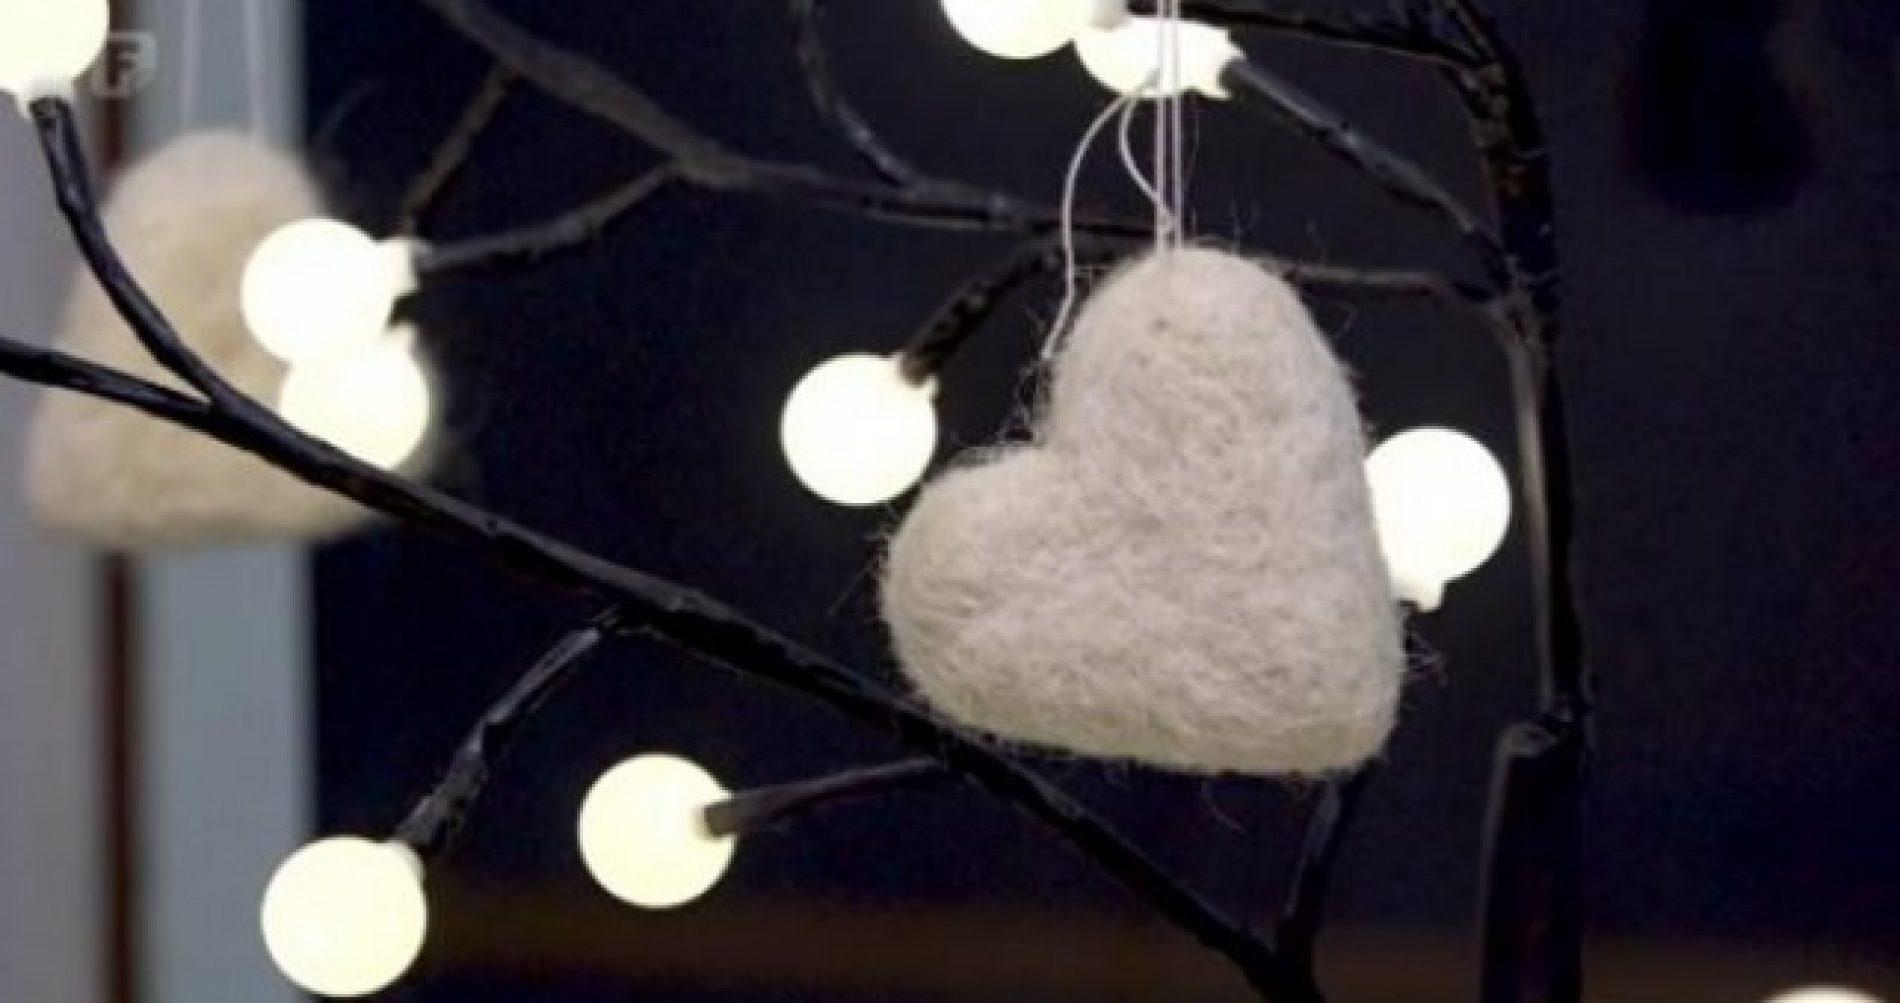 Vuneno srce iz Travnika osvaja tržište i donosi korist za dvadesetak žena (Video)